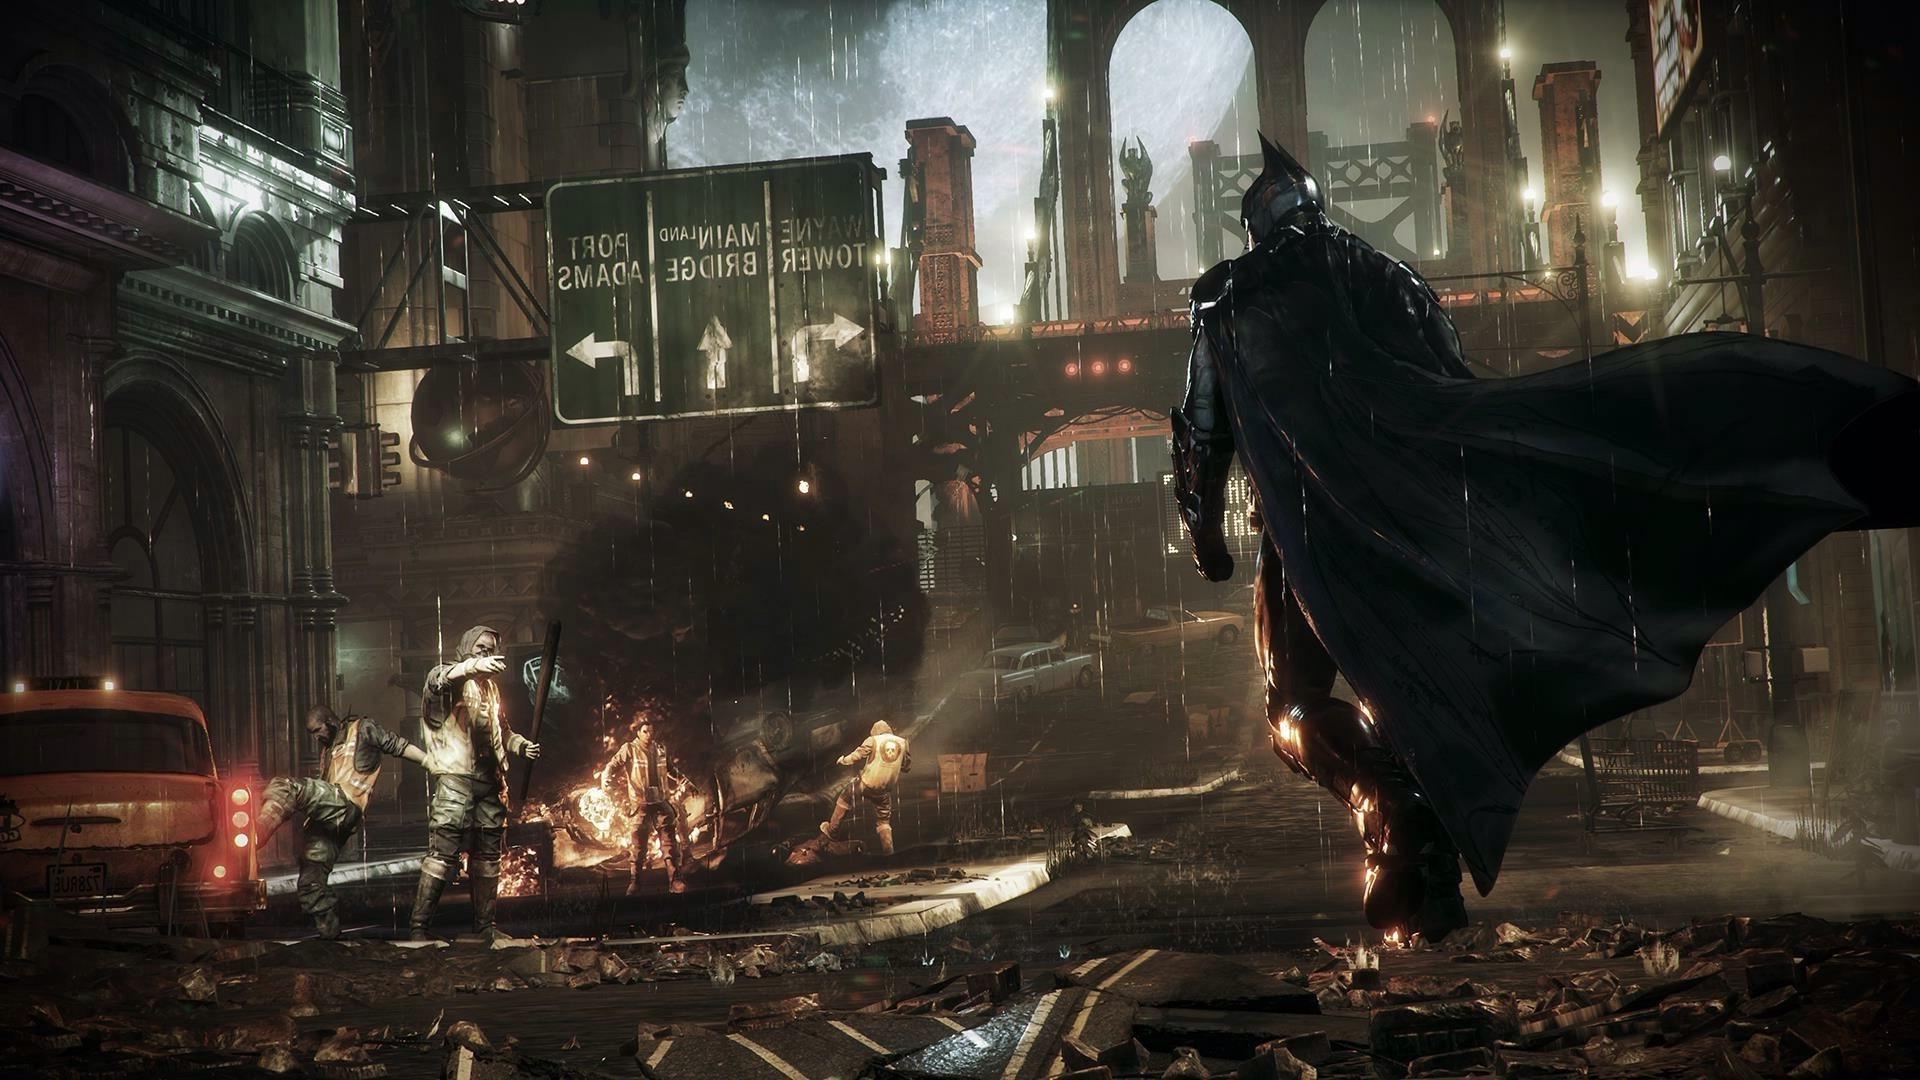 1920x1080 Px Batman Arkham Knight Building Fire Gotham City Smoke Street Taxi